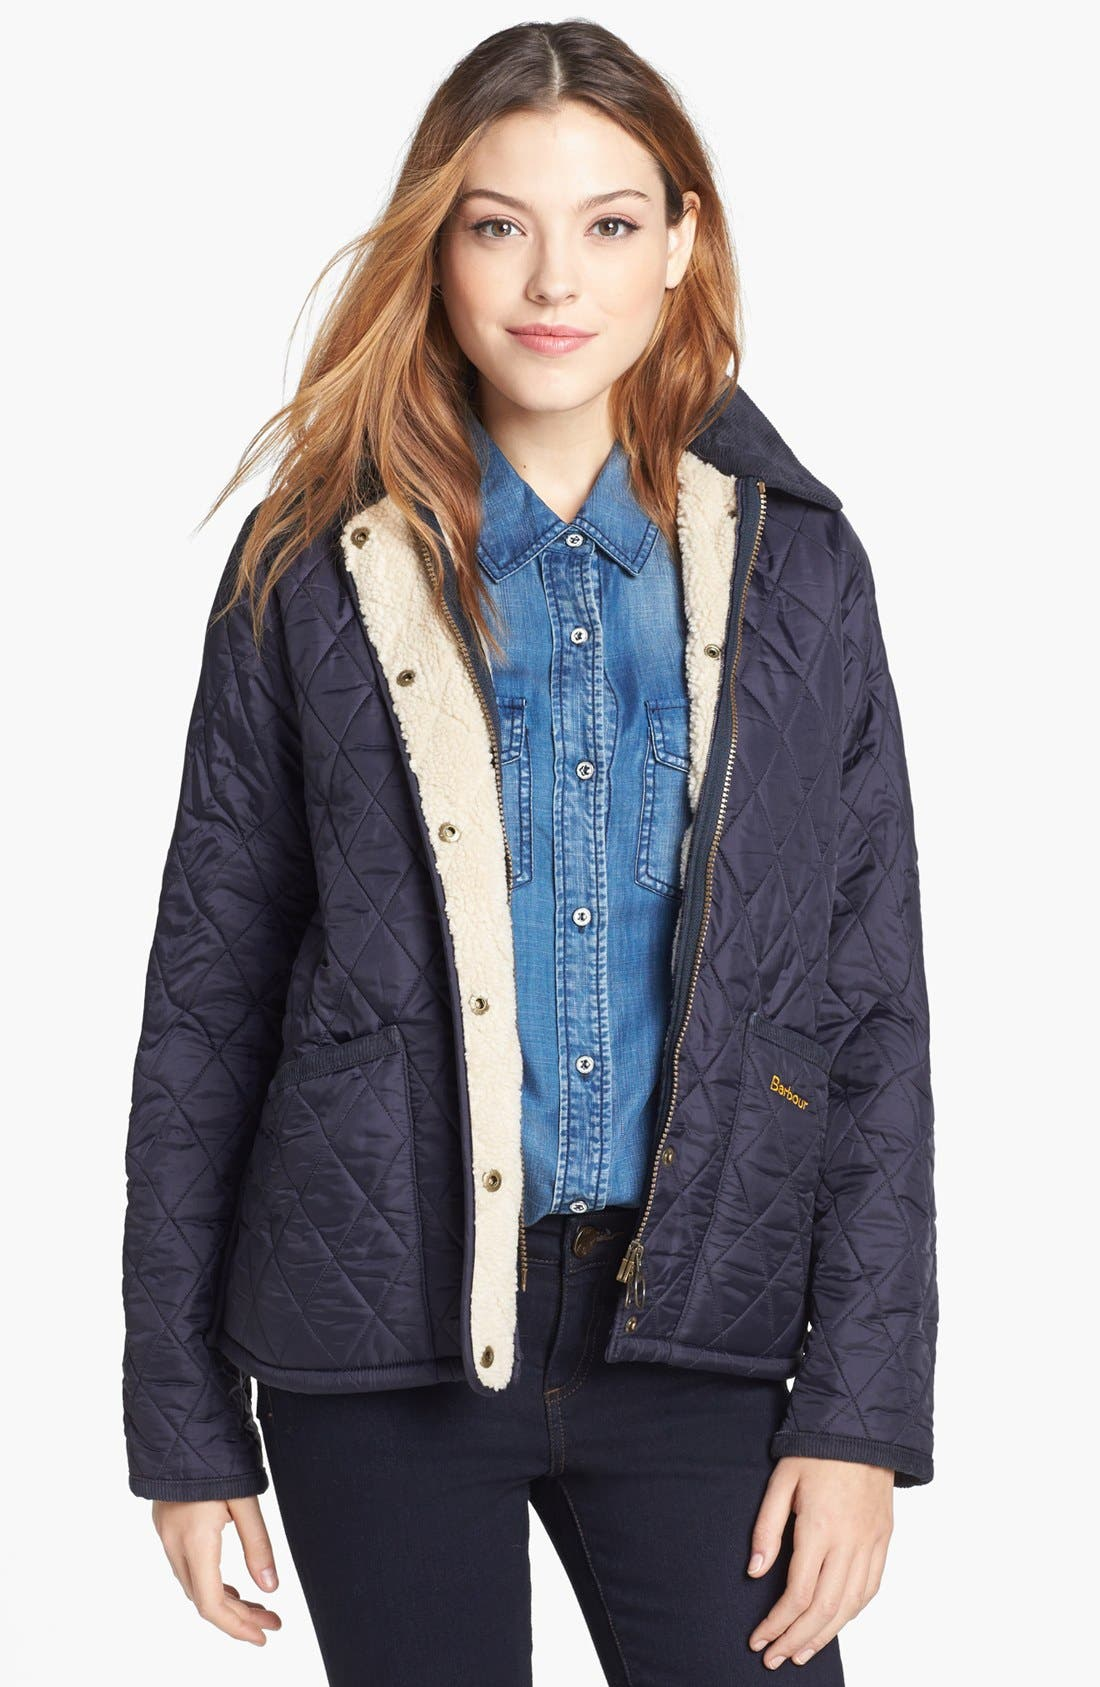 Alternate Image 1 Selected - Barbour 'Vintage Liddesdale' Quilted Jacket